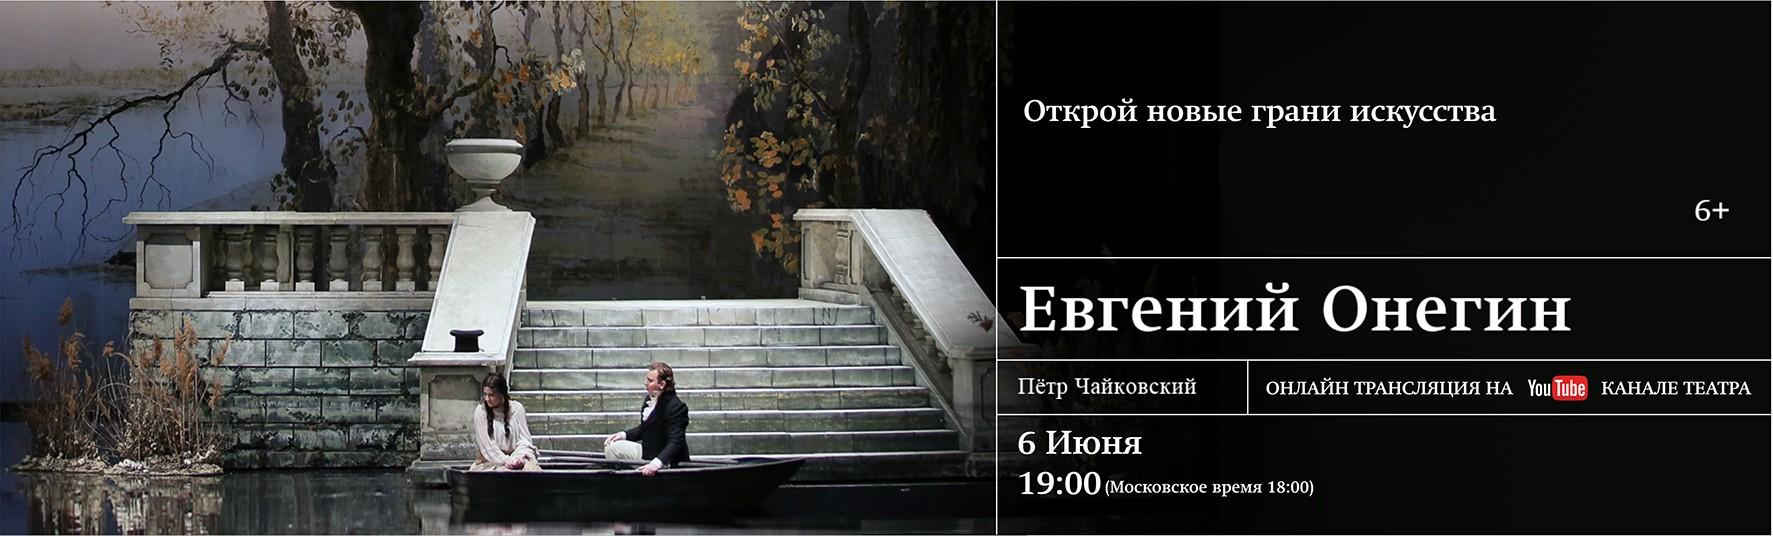 Евгений Онегин онлайн